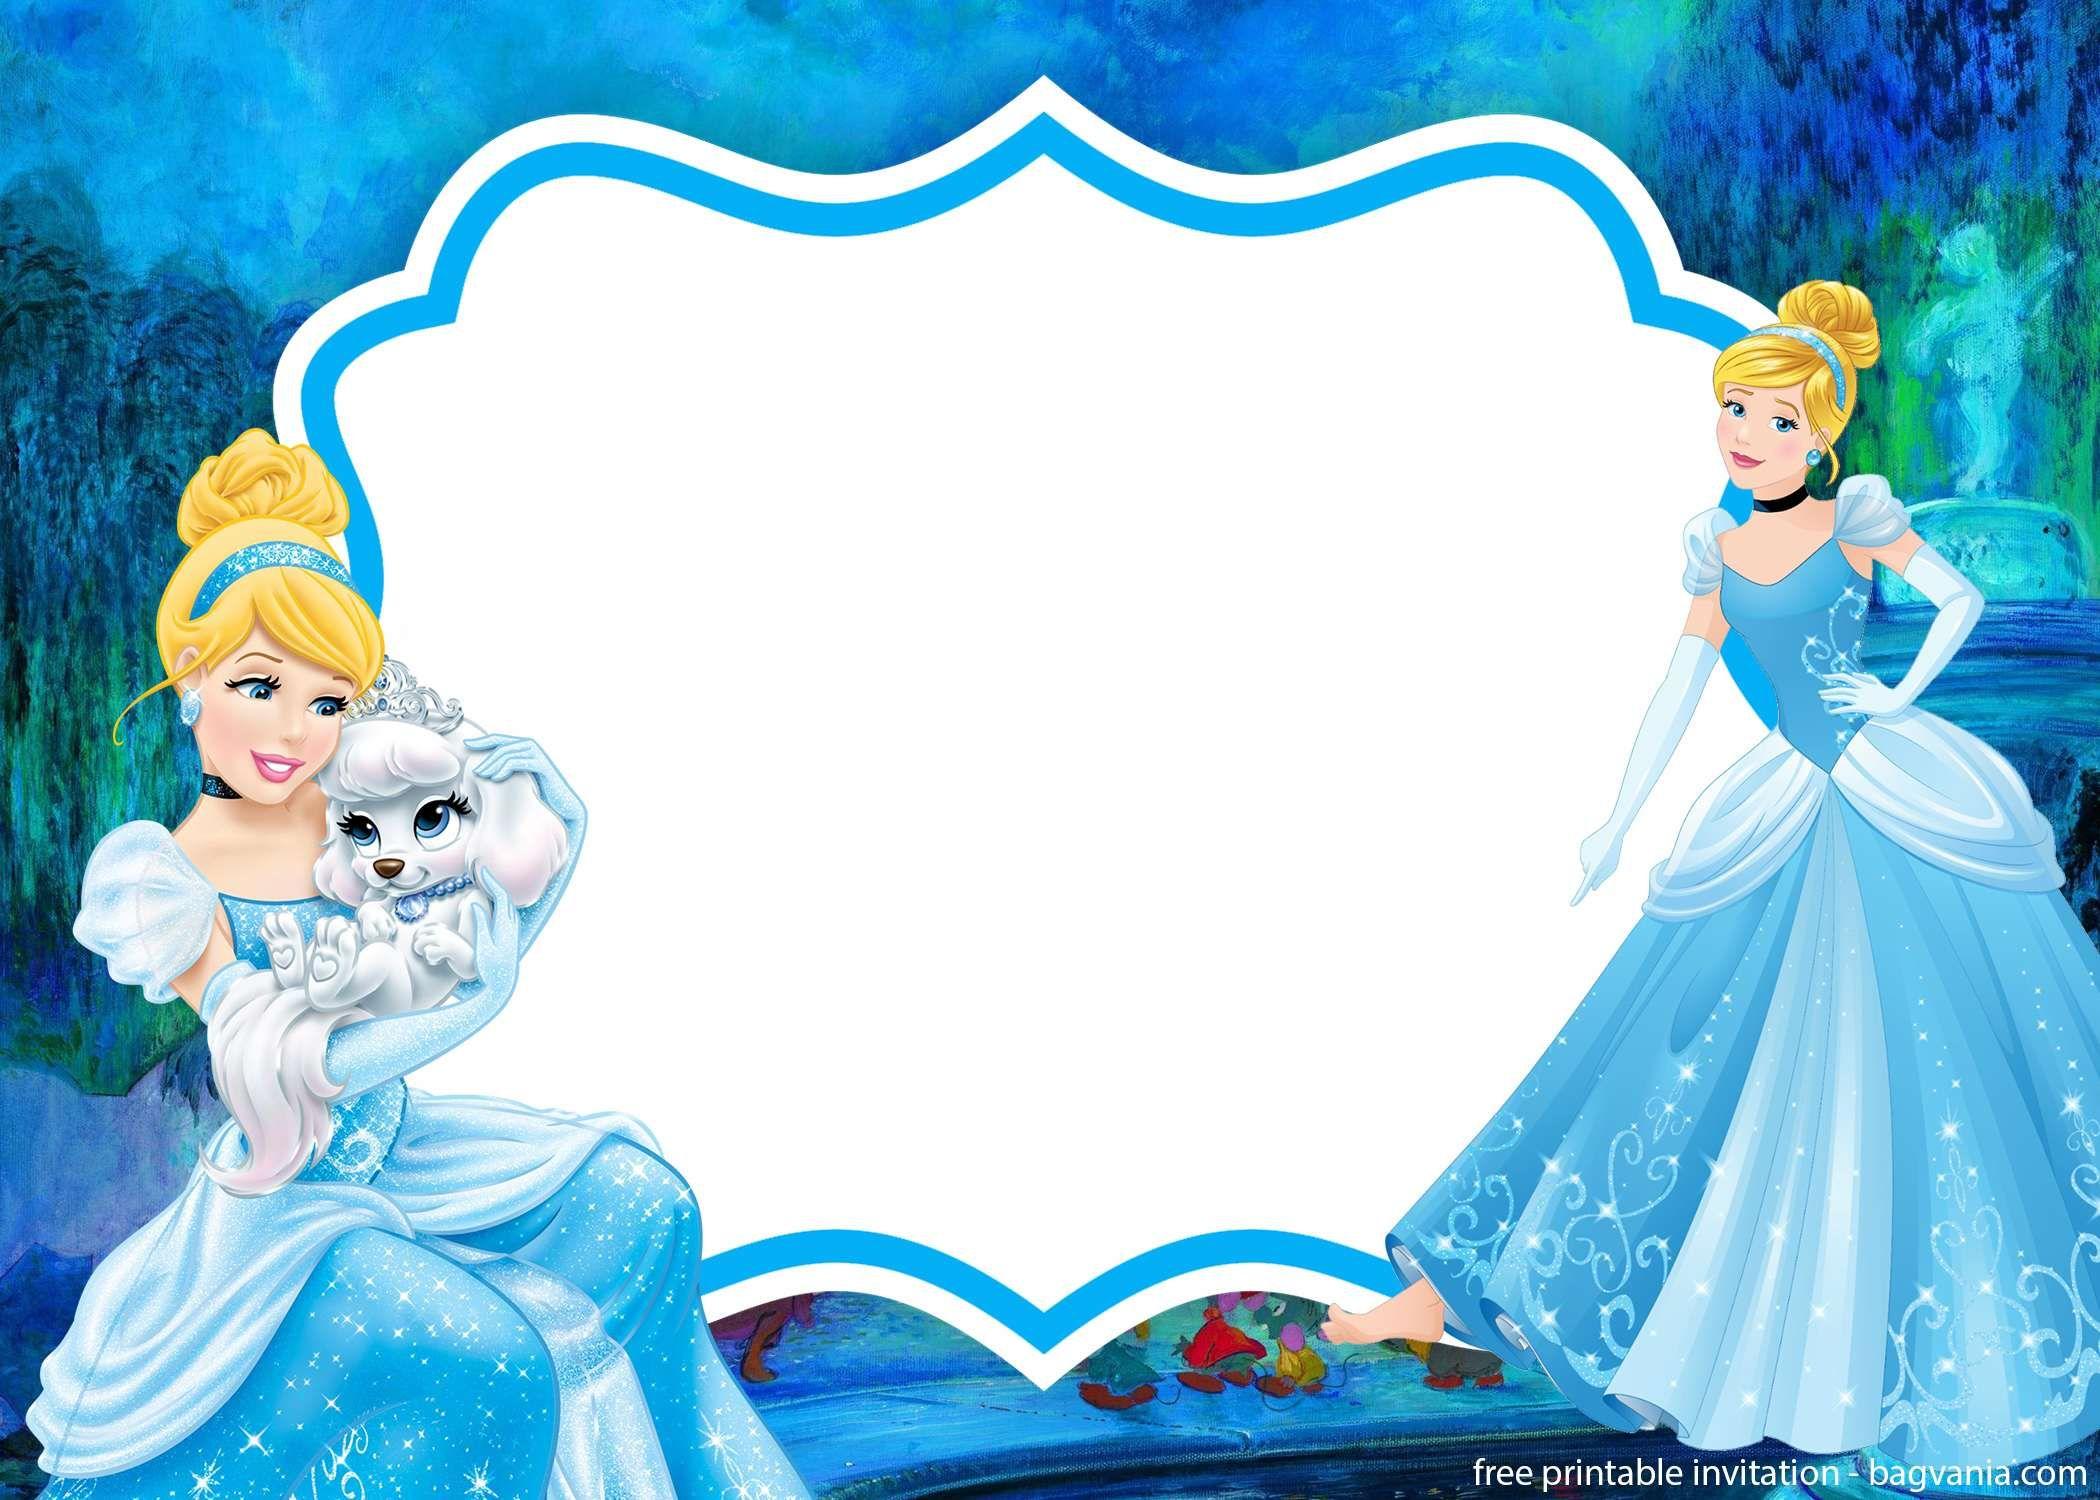 Free Printable Cinderella Invitation Template Cinderella Invitations Printable Birthday Invitations Birthday Card Template